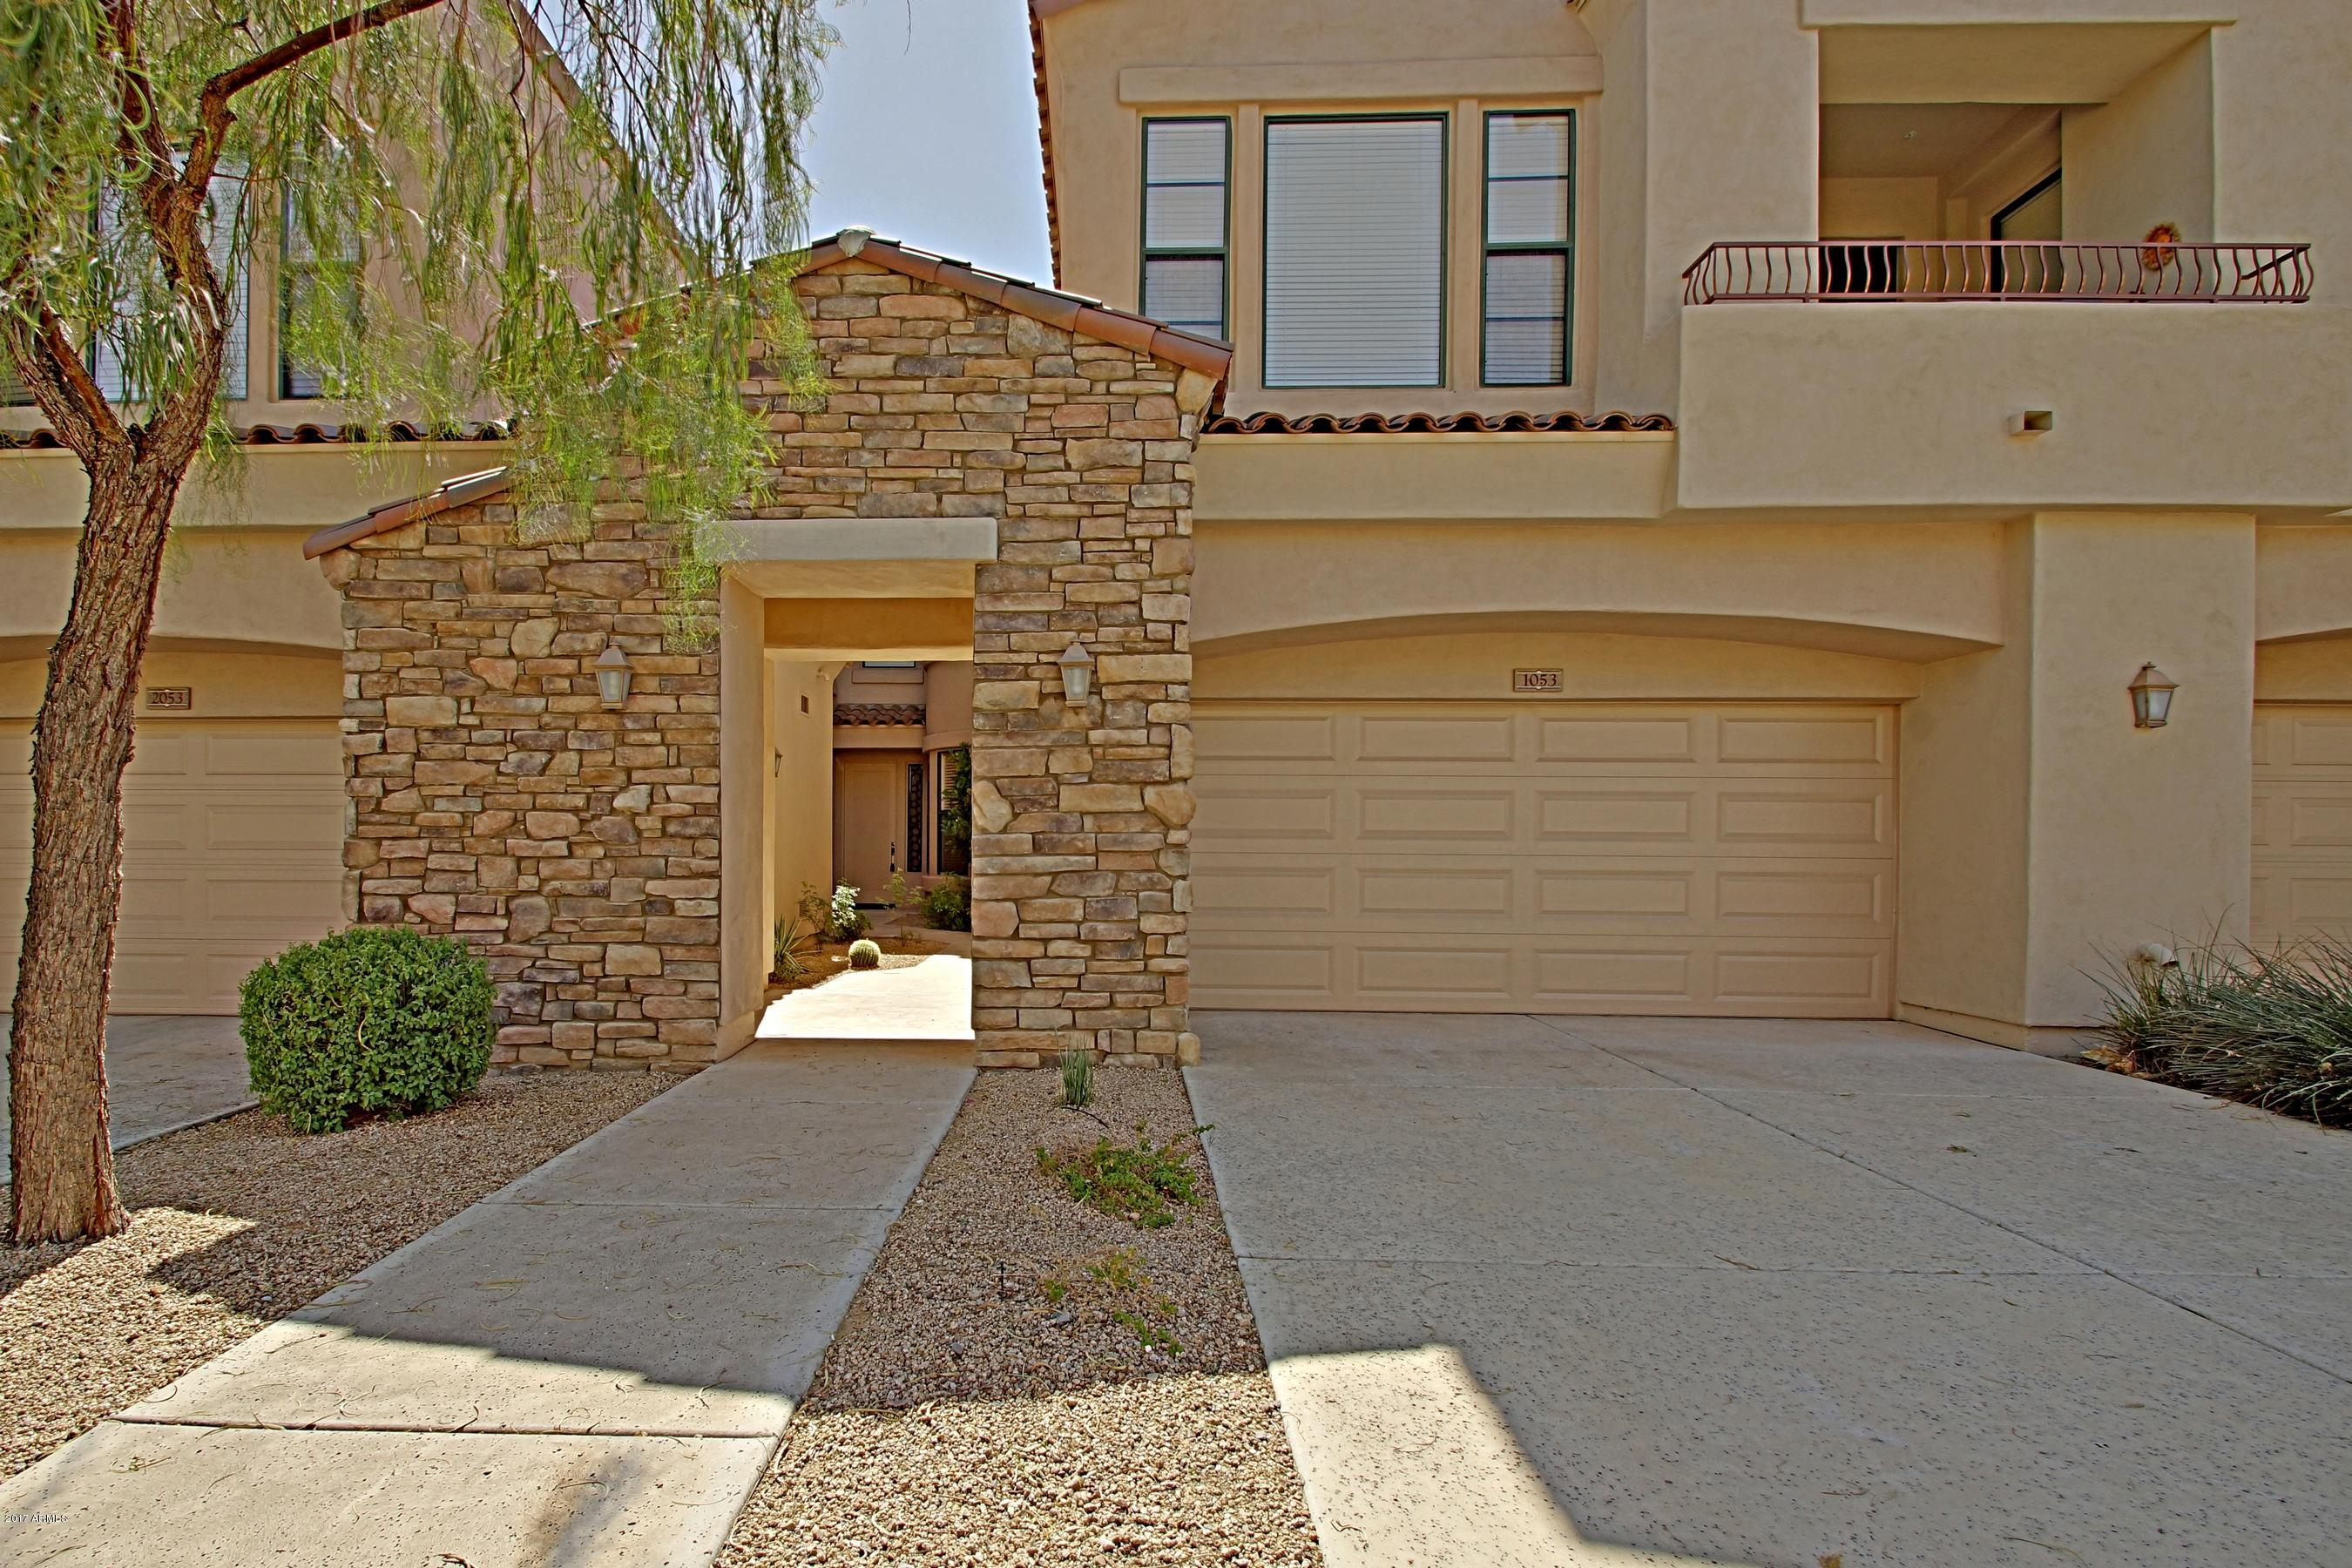 19550 N Grayhawk Drive, Unit 1053, Scottsdale AZ 85255 - Photo 1